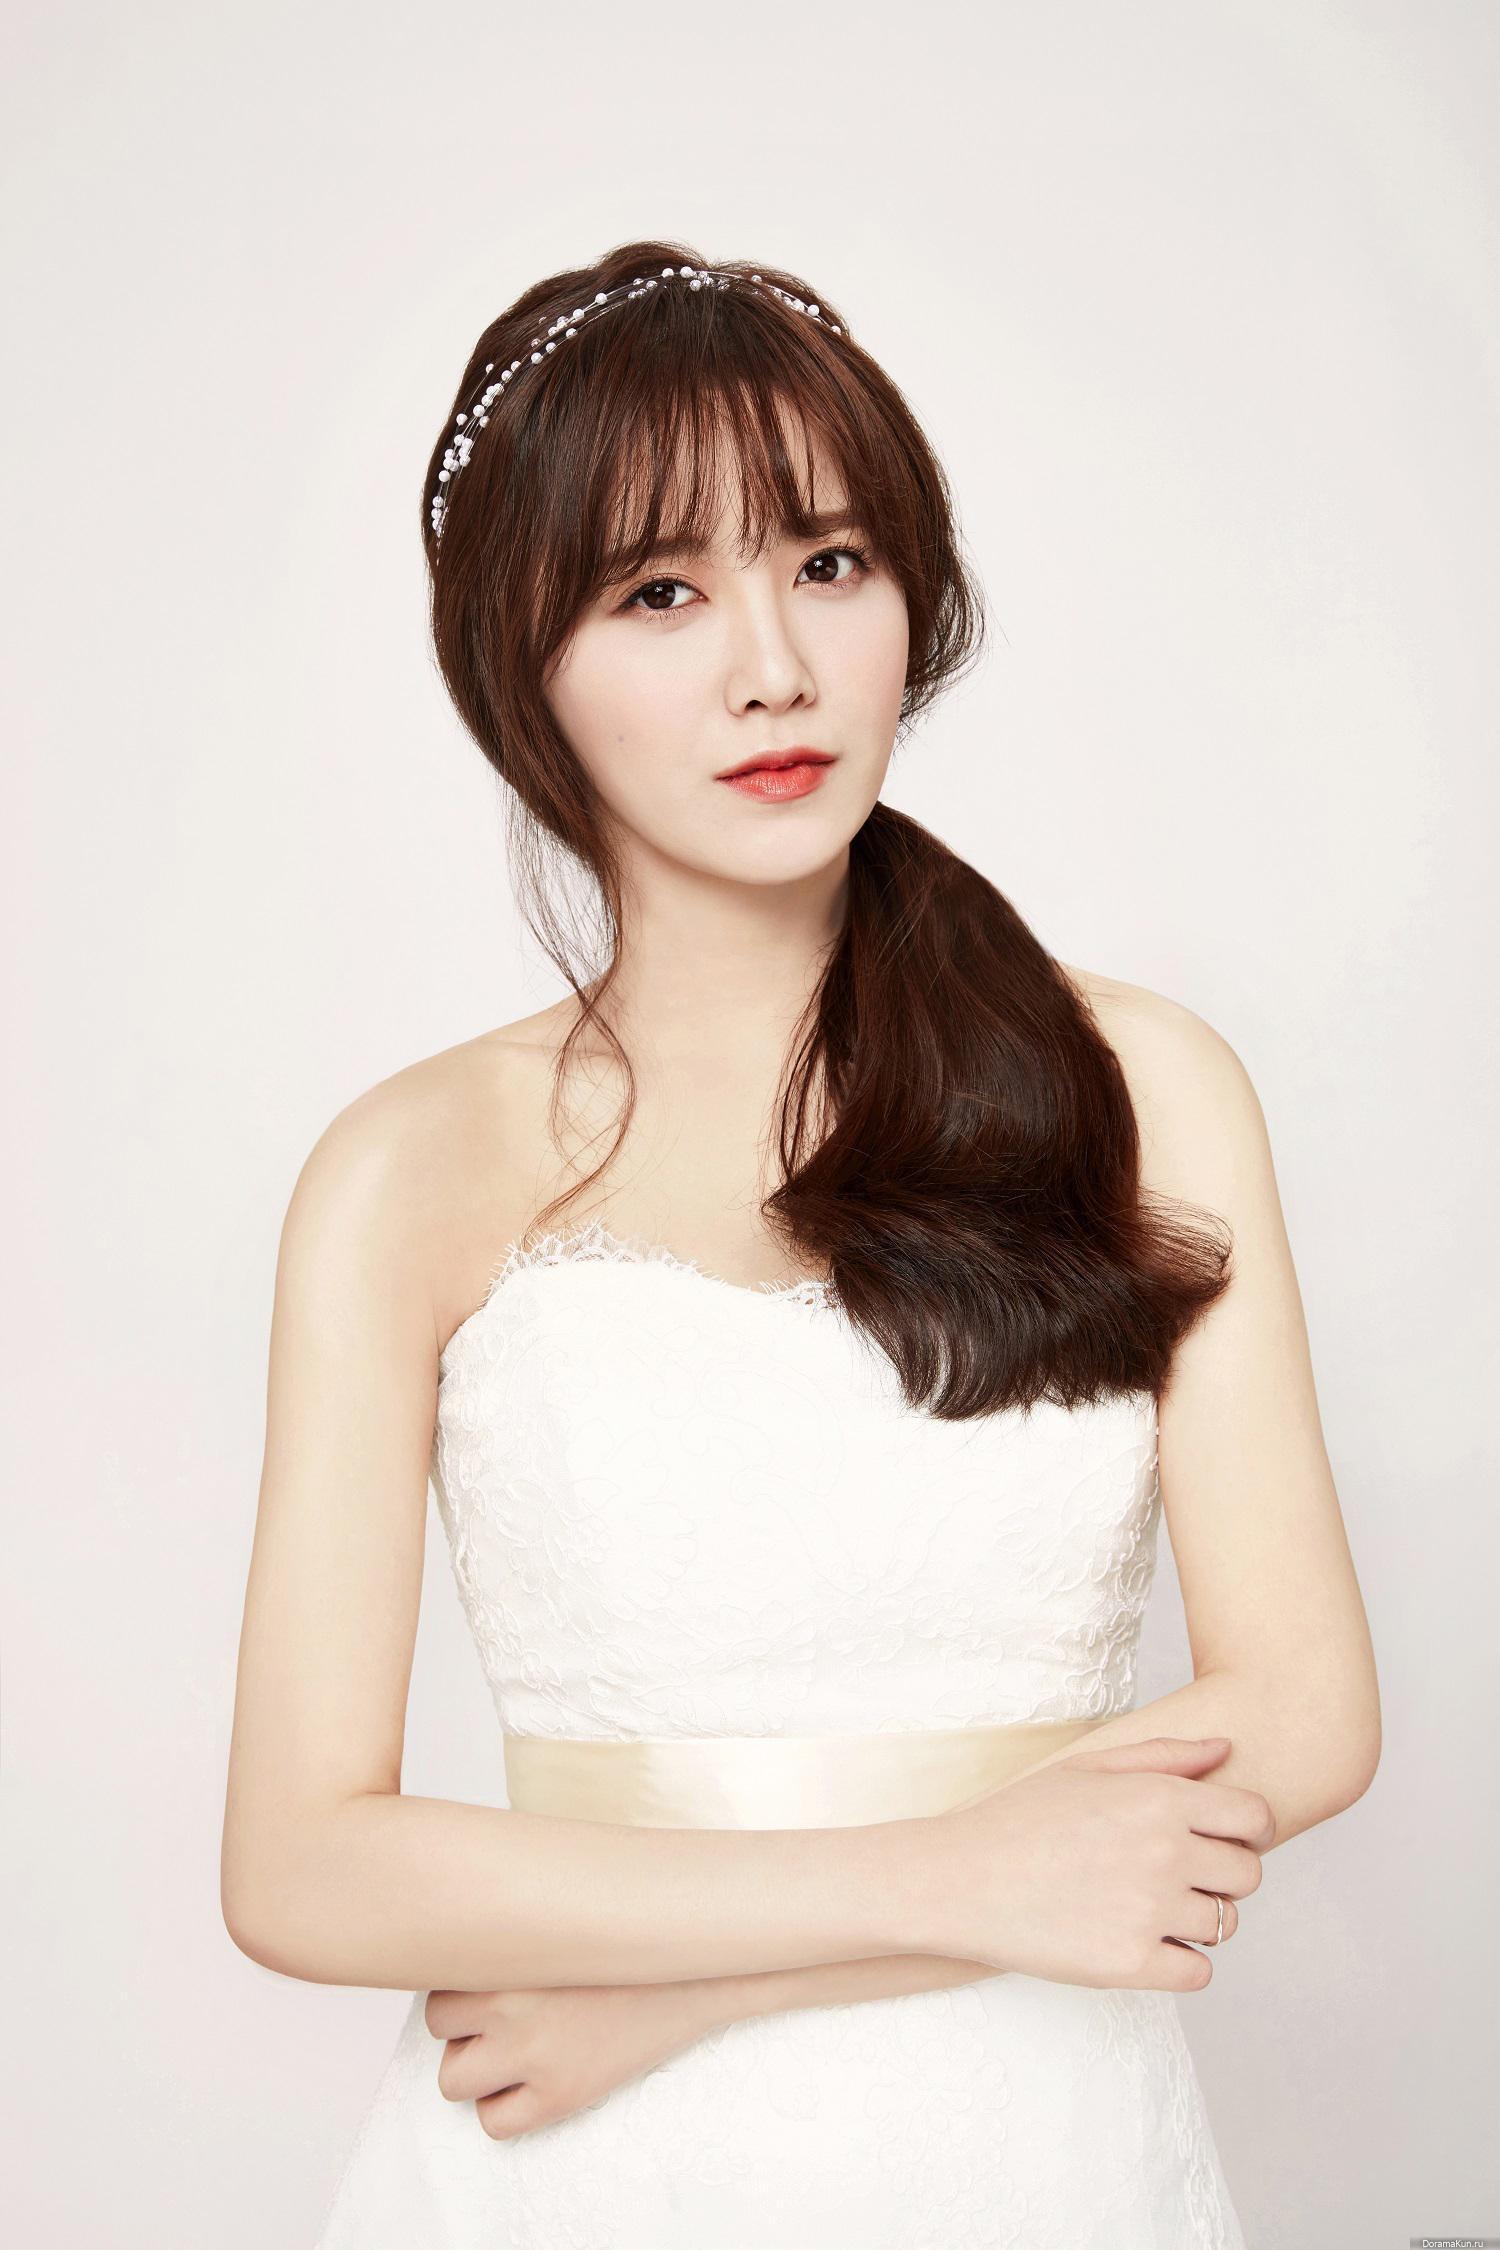 Ku Hye Sun And Ahn Jae Hyun Reveal Wedding Photos Soompi Gu hye sun pictures